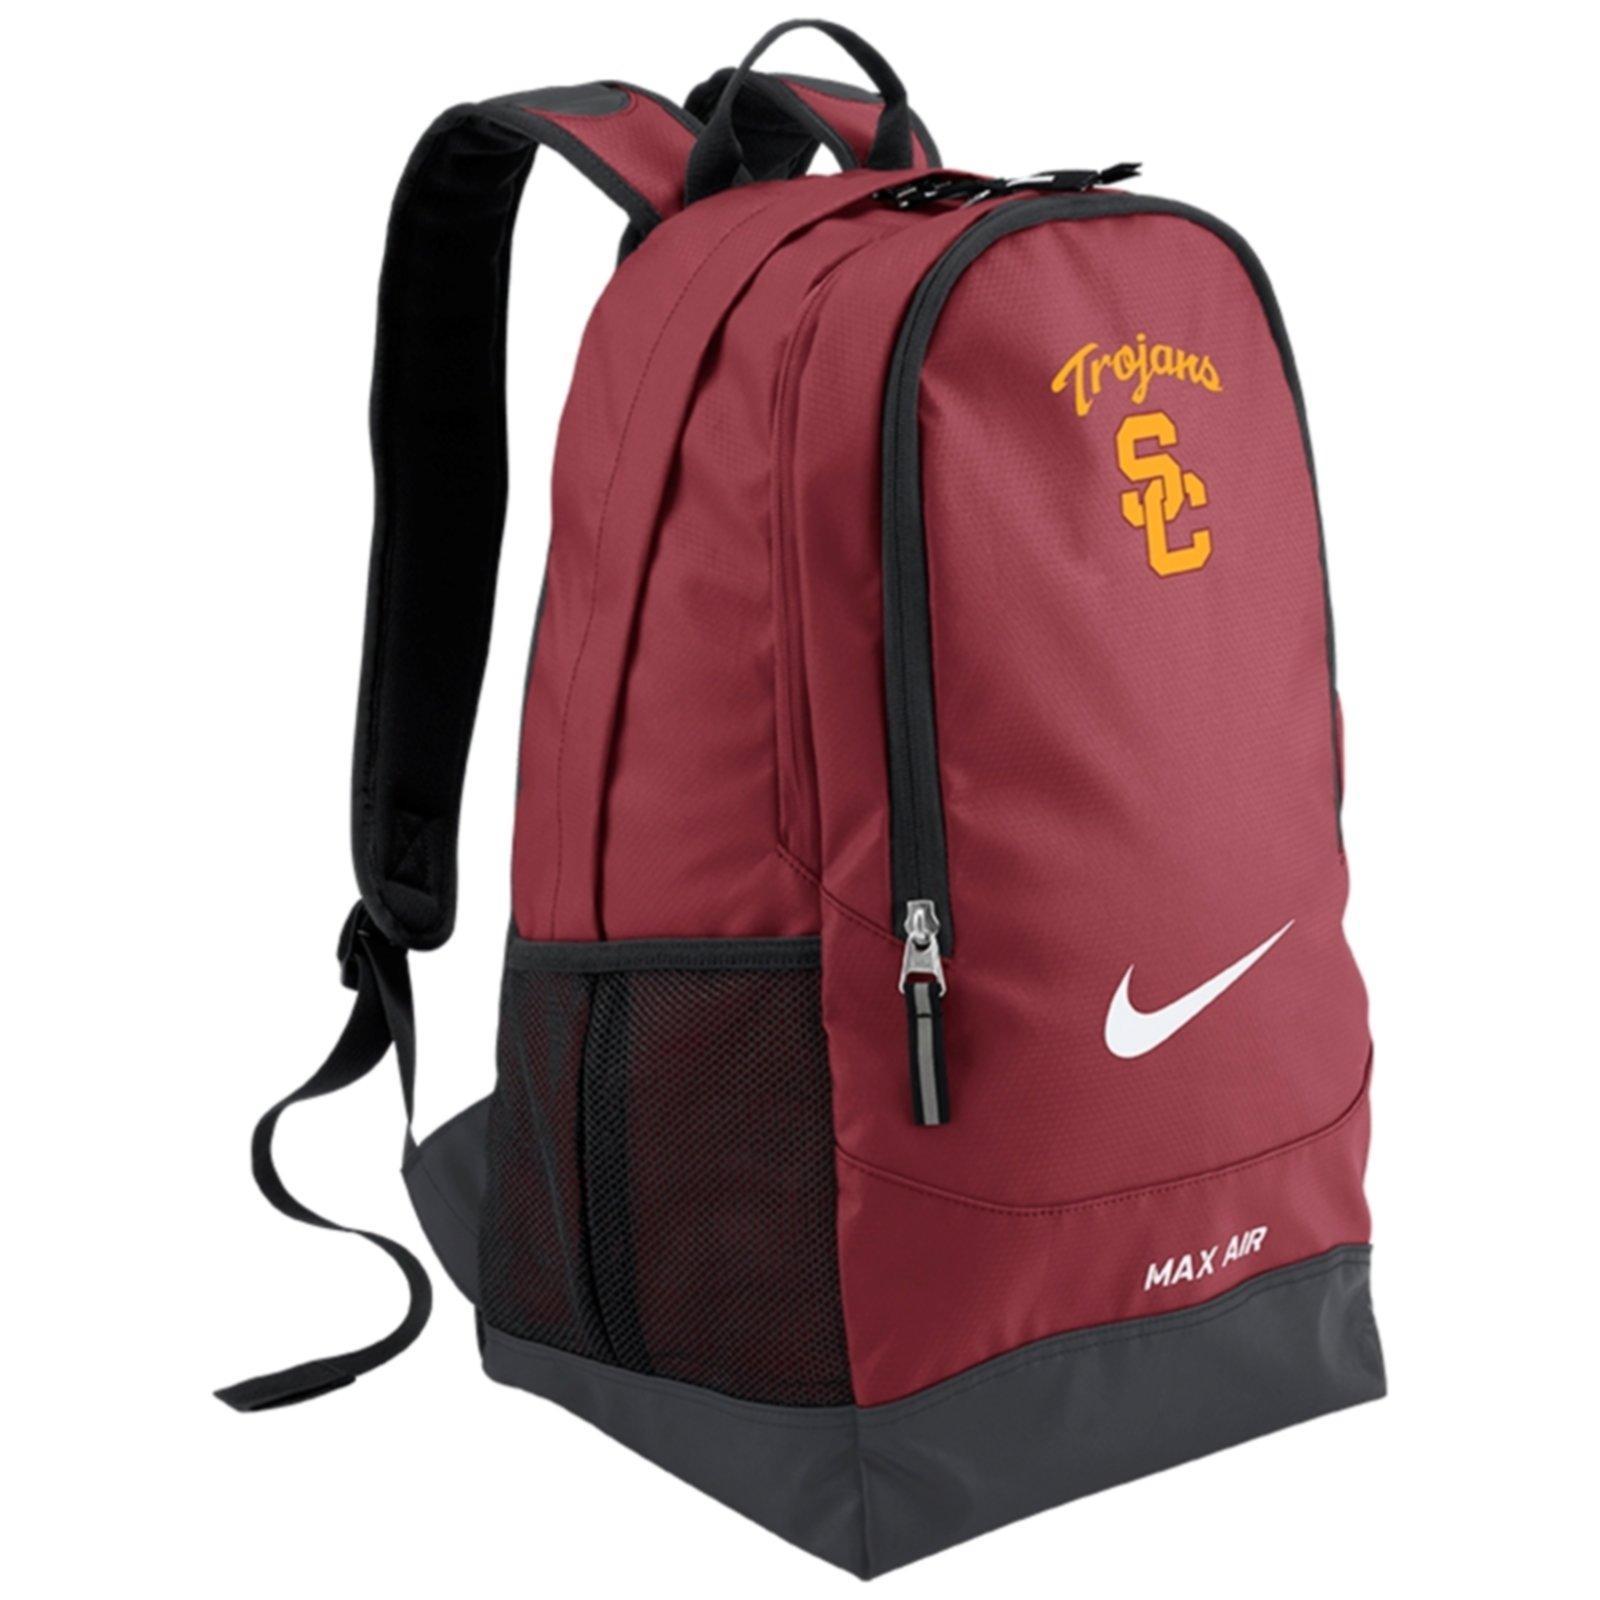 f5f8f6f4ea Nike Vapor Max Air Backpack Black Yellow- Fenix Toulouse Handball